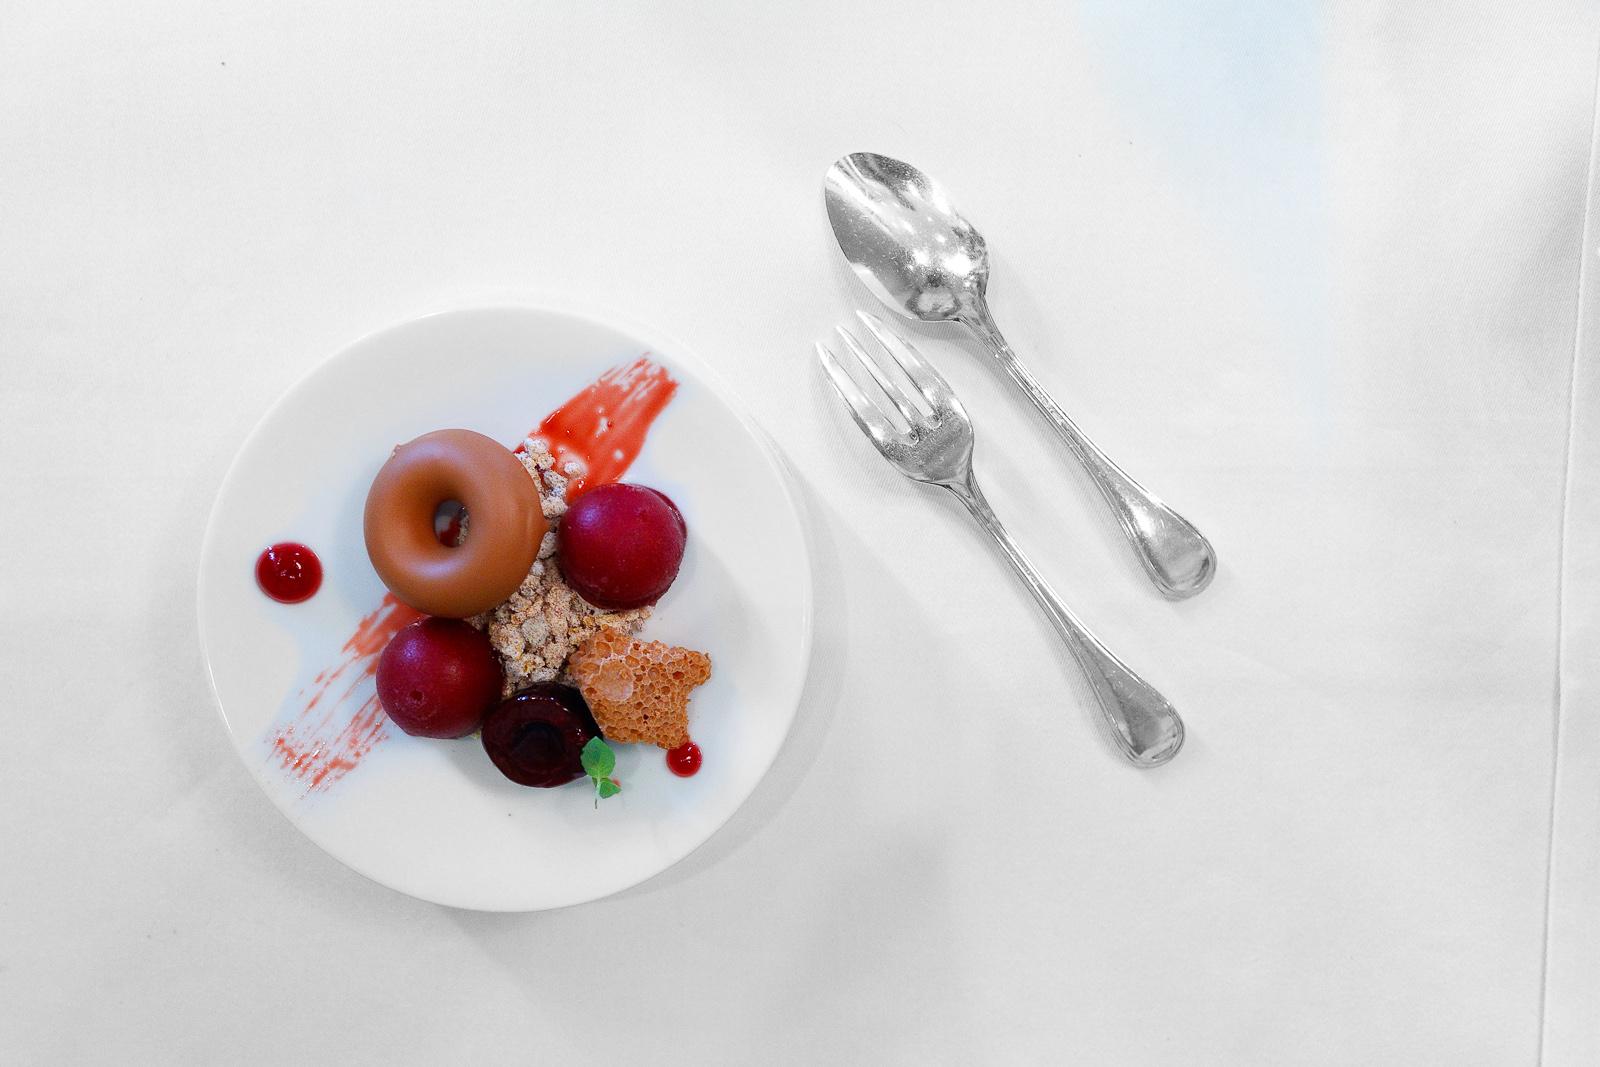 5th Course: Tanariva lactée, airy - liquid - solid, marinated cherries, caramelized quinoa